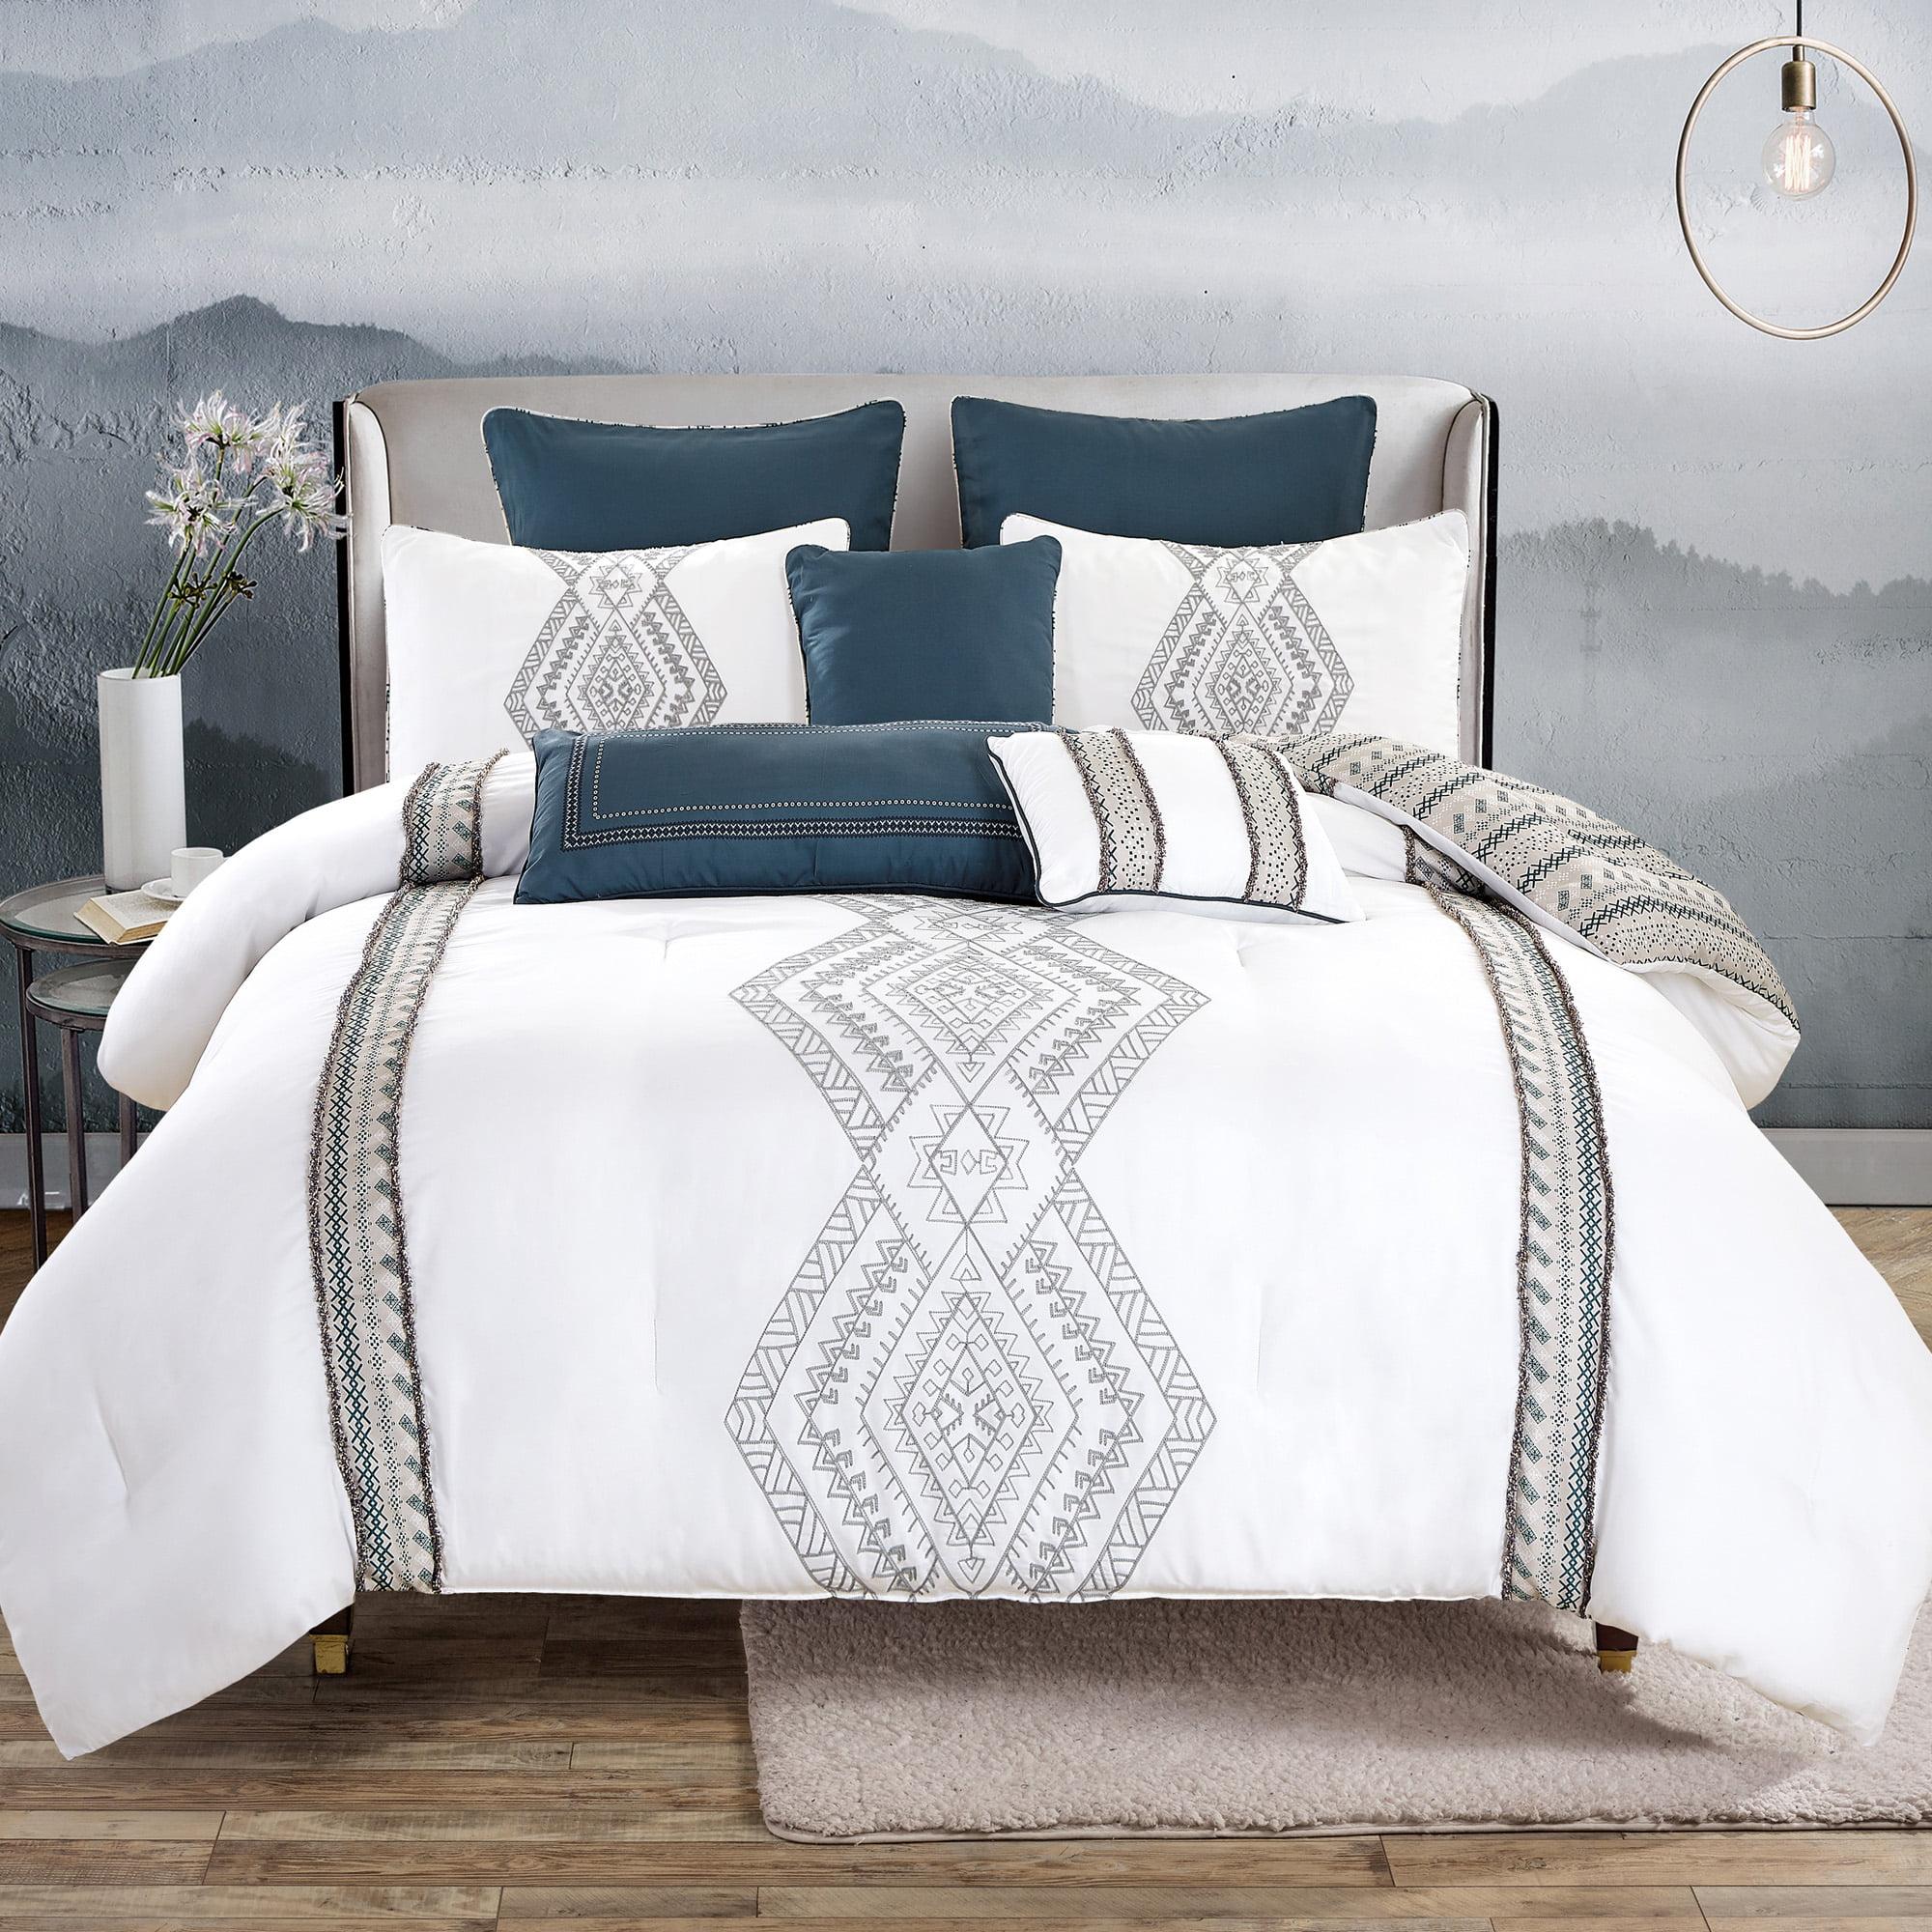 hgmart bedding comforter set bed in a bag - 8 piece luxury